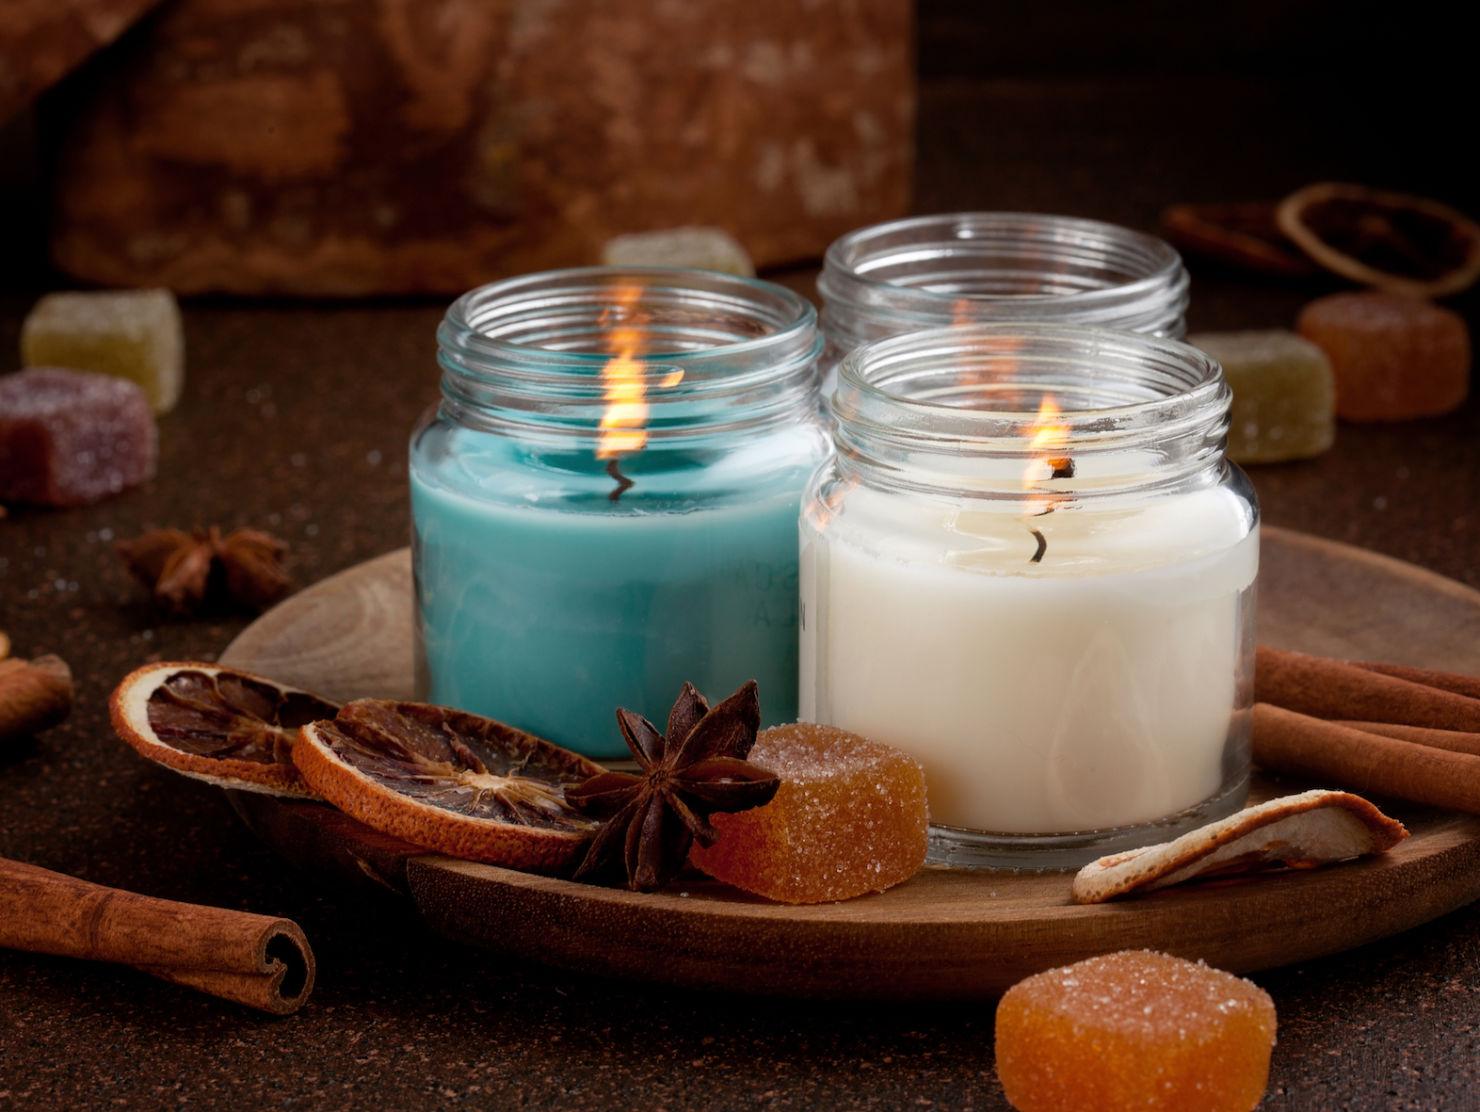 Atrae energía positiva a tu hogar con estas velas aromáticas caseras